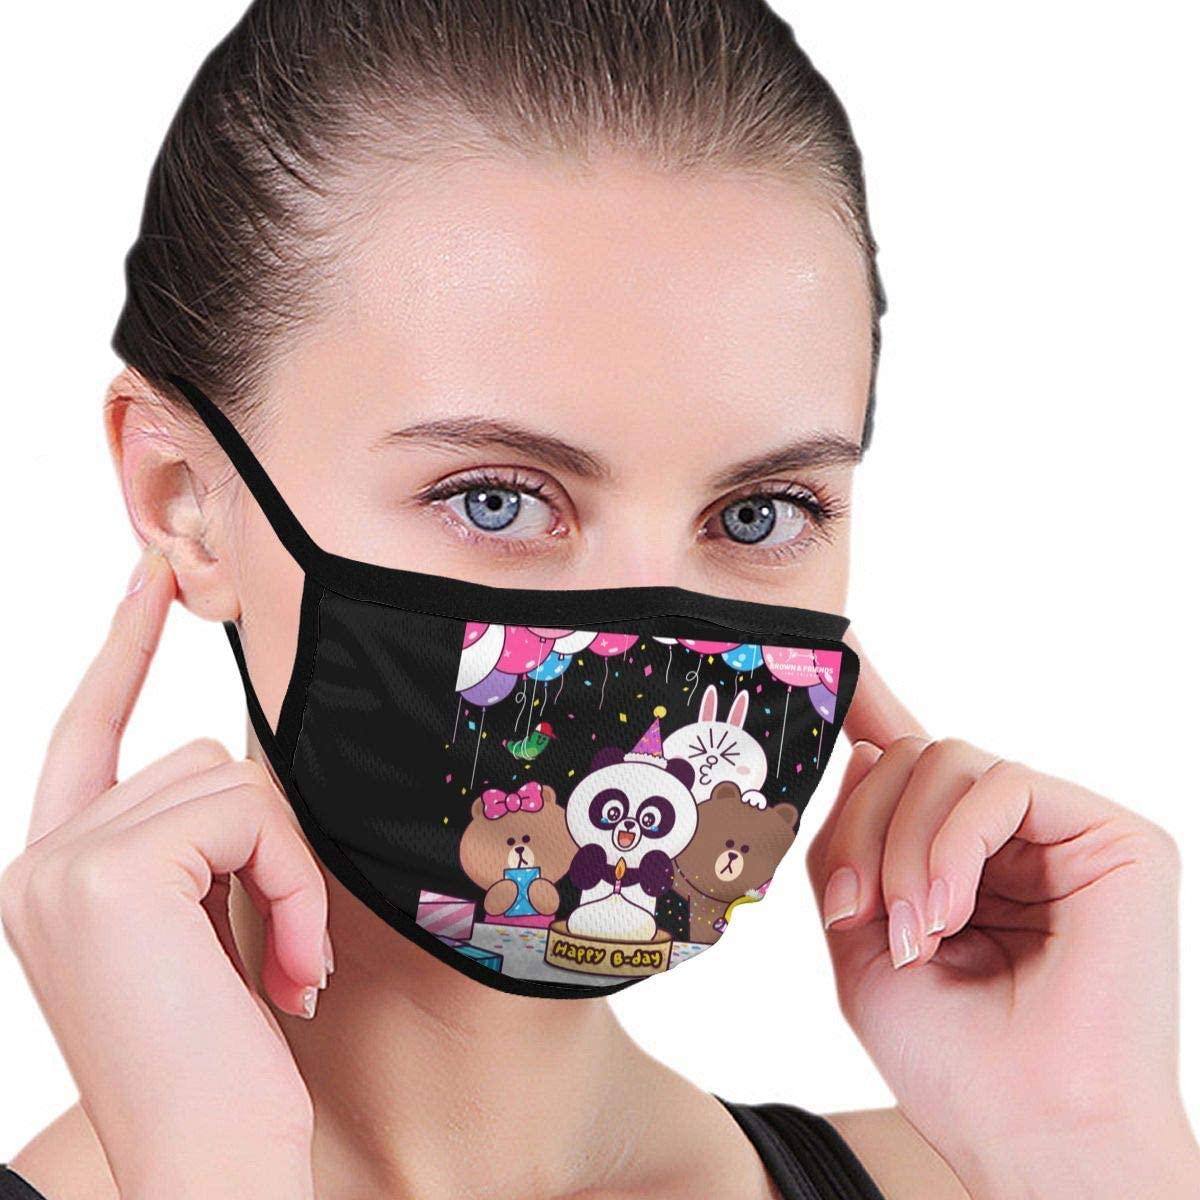 Qwtykeertyi Line Friends Fashion Protective Reusable Unisex Black Cotton Washable Balaclava